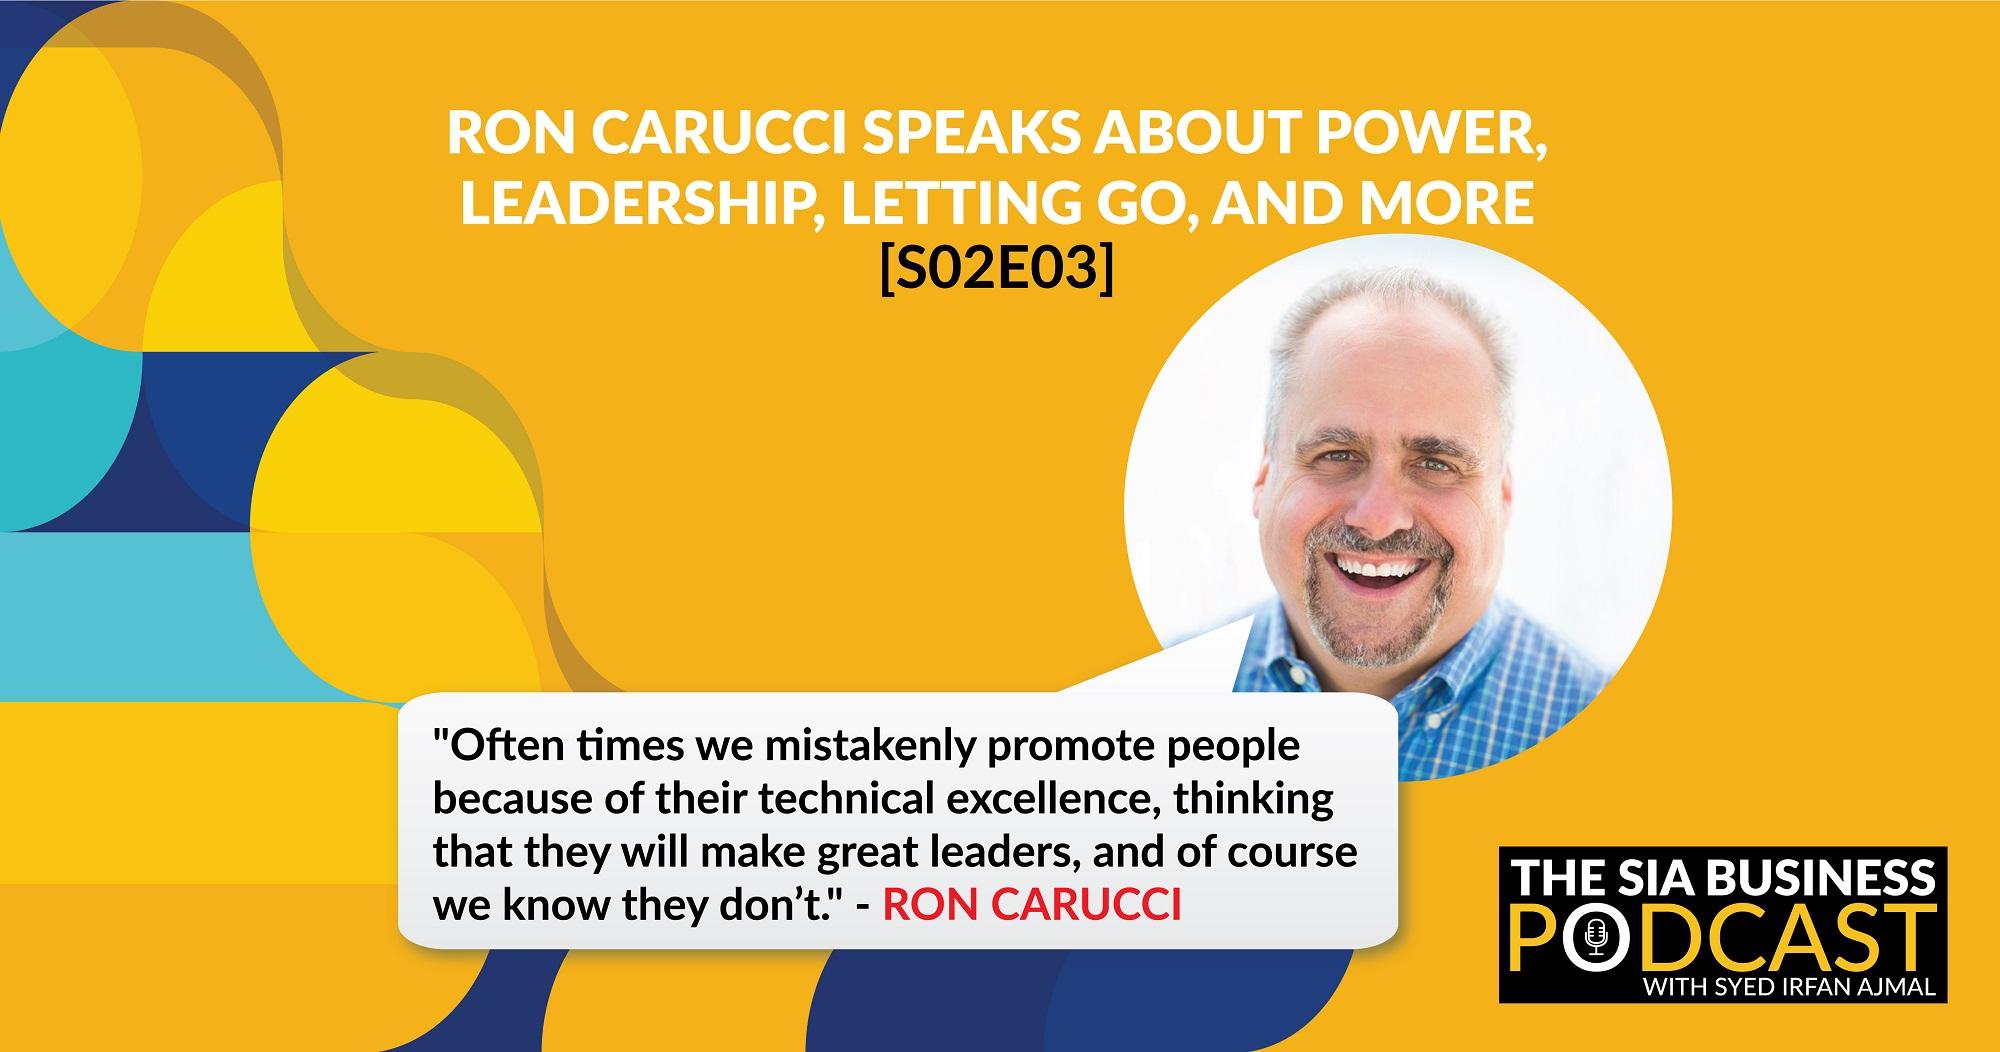 Ron Carucci on the SIA Business Podcast